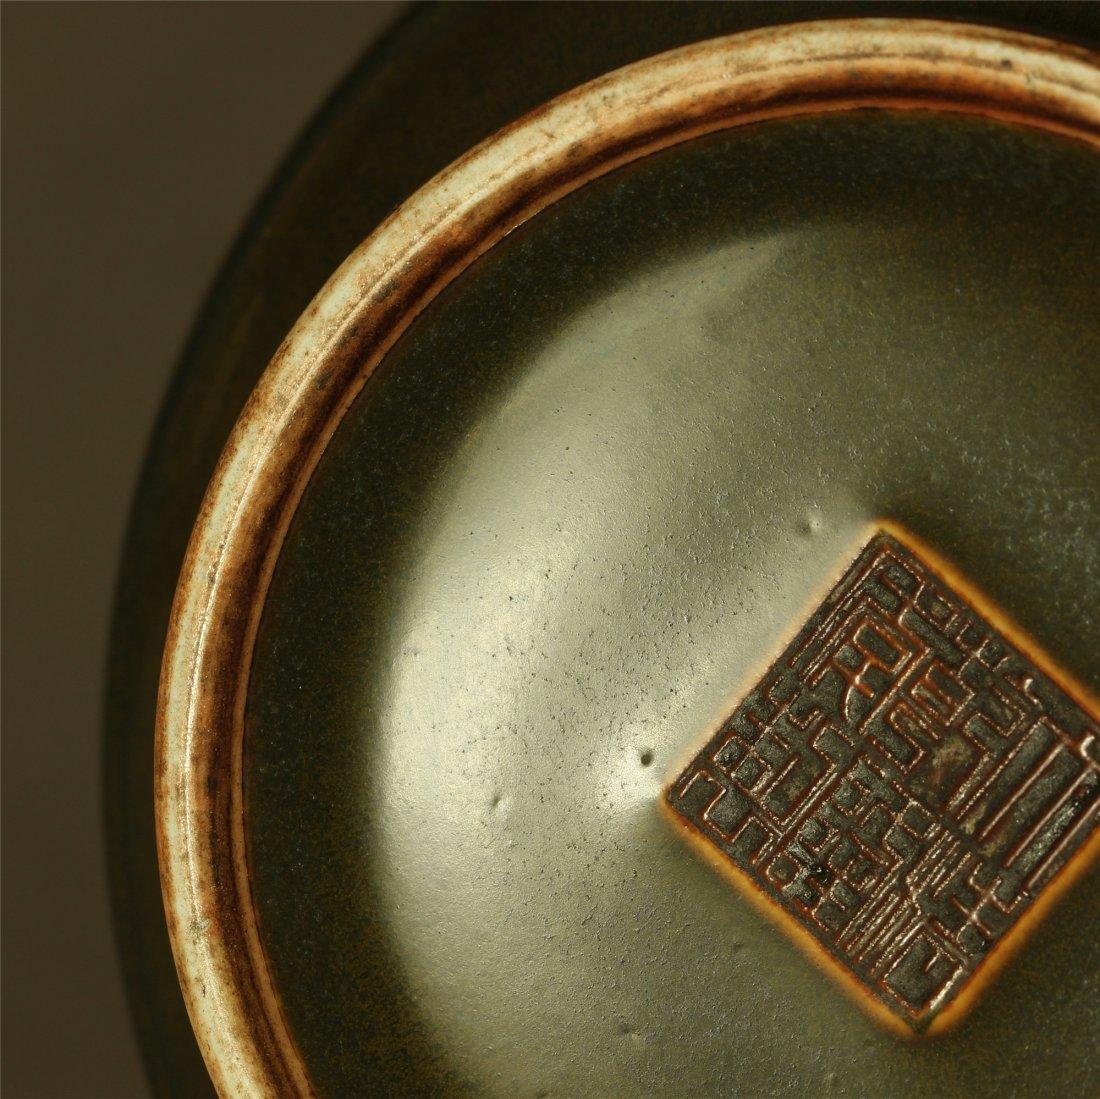 Tea glaze porcelain vase of Qing Dynasty QianLong - 8